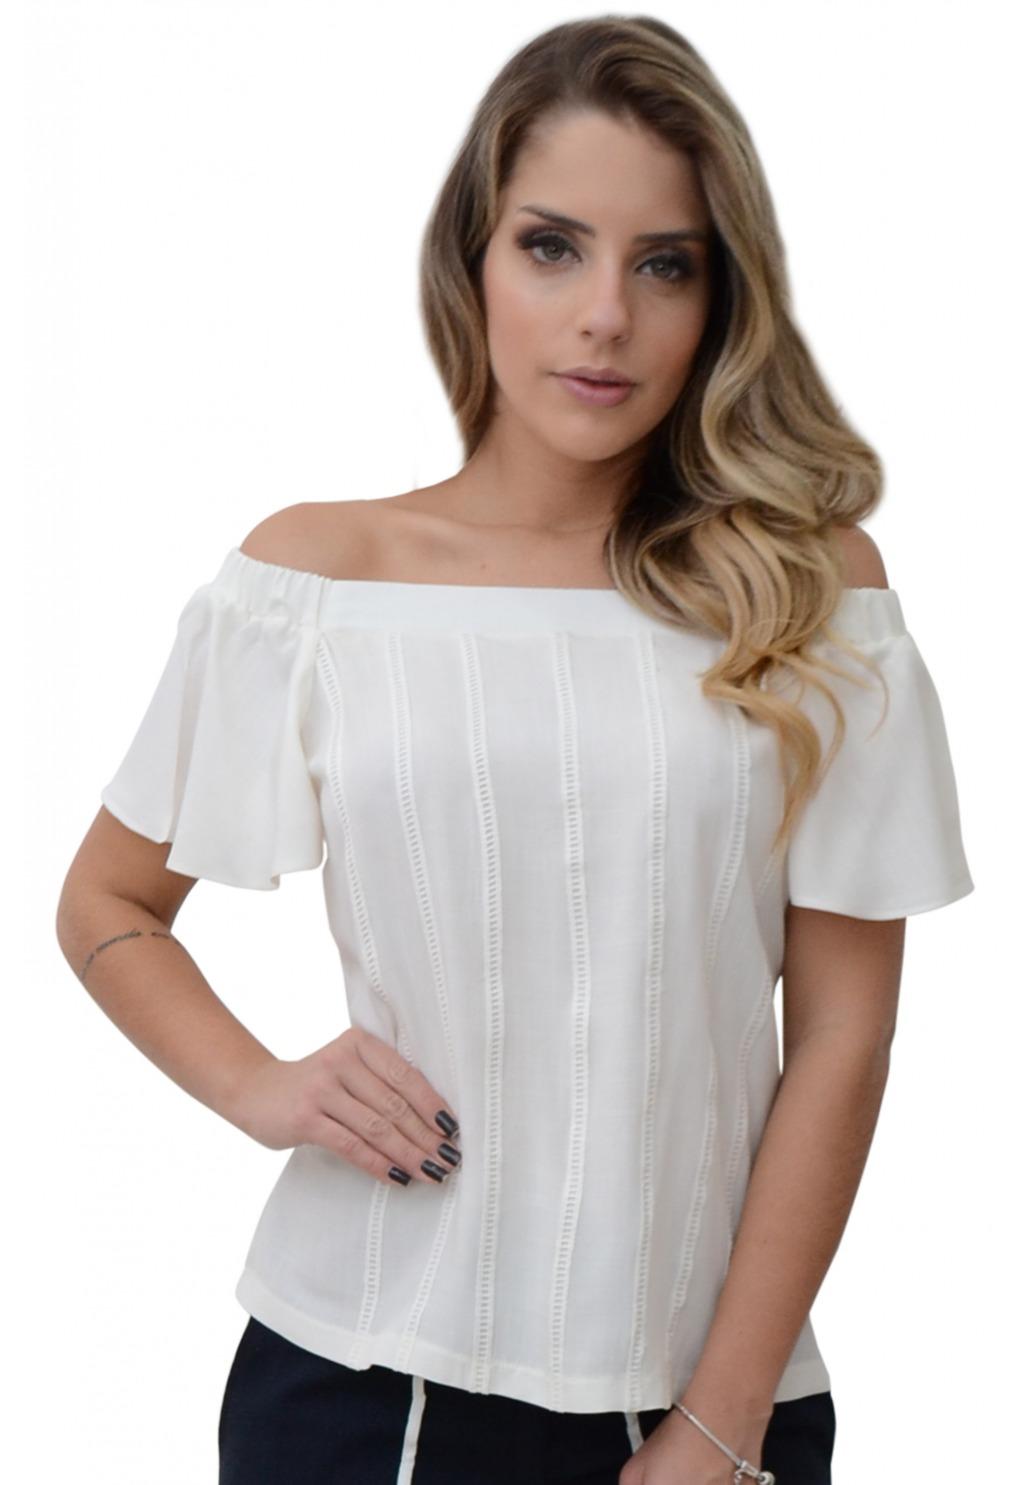 Blusa Mamorena ombro elástico frente ponto palito